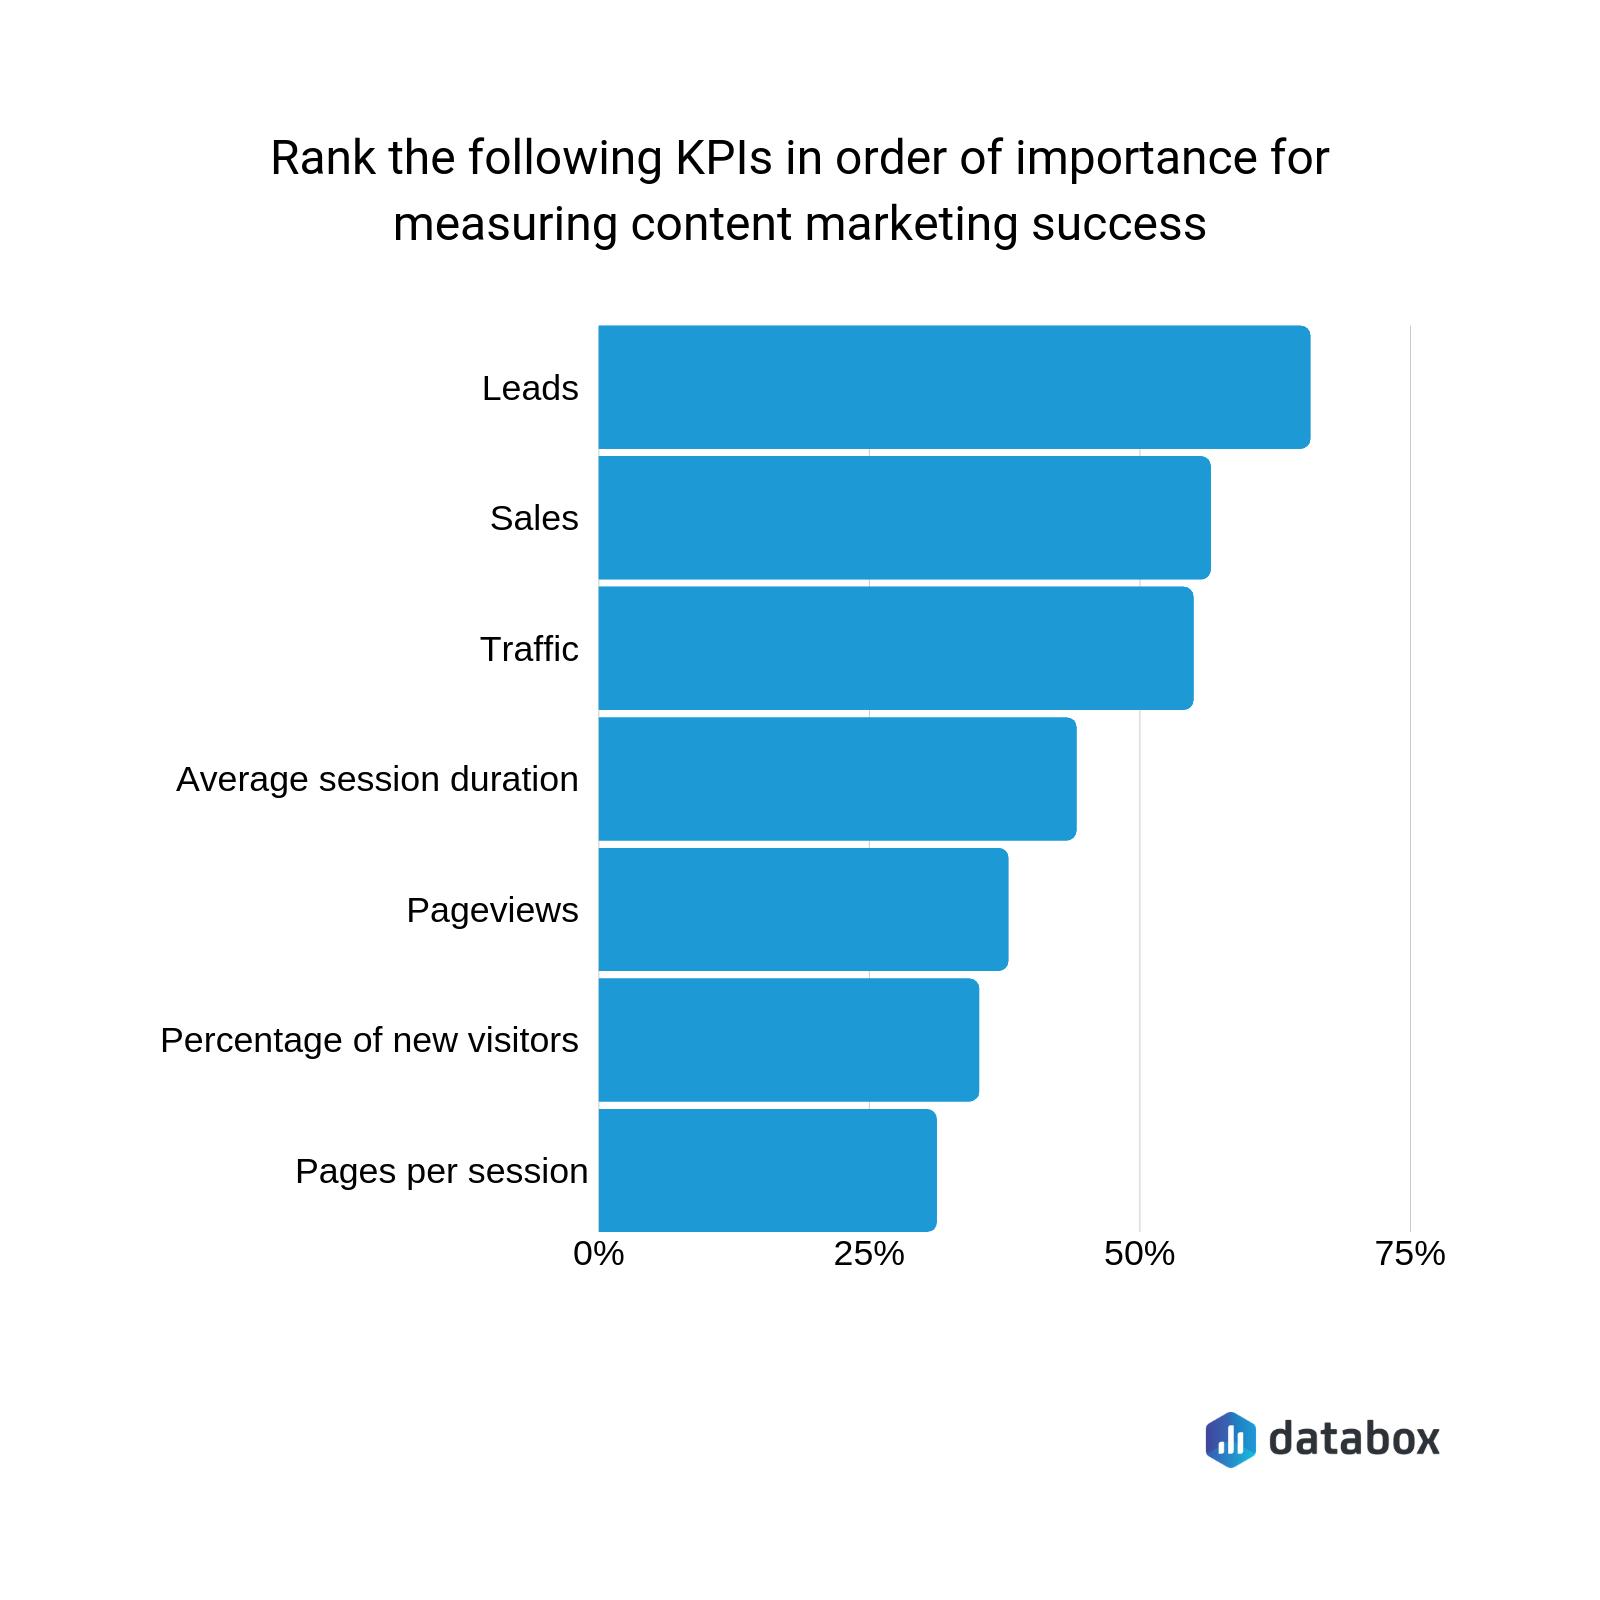 most important content marketing KPIs survey results graph